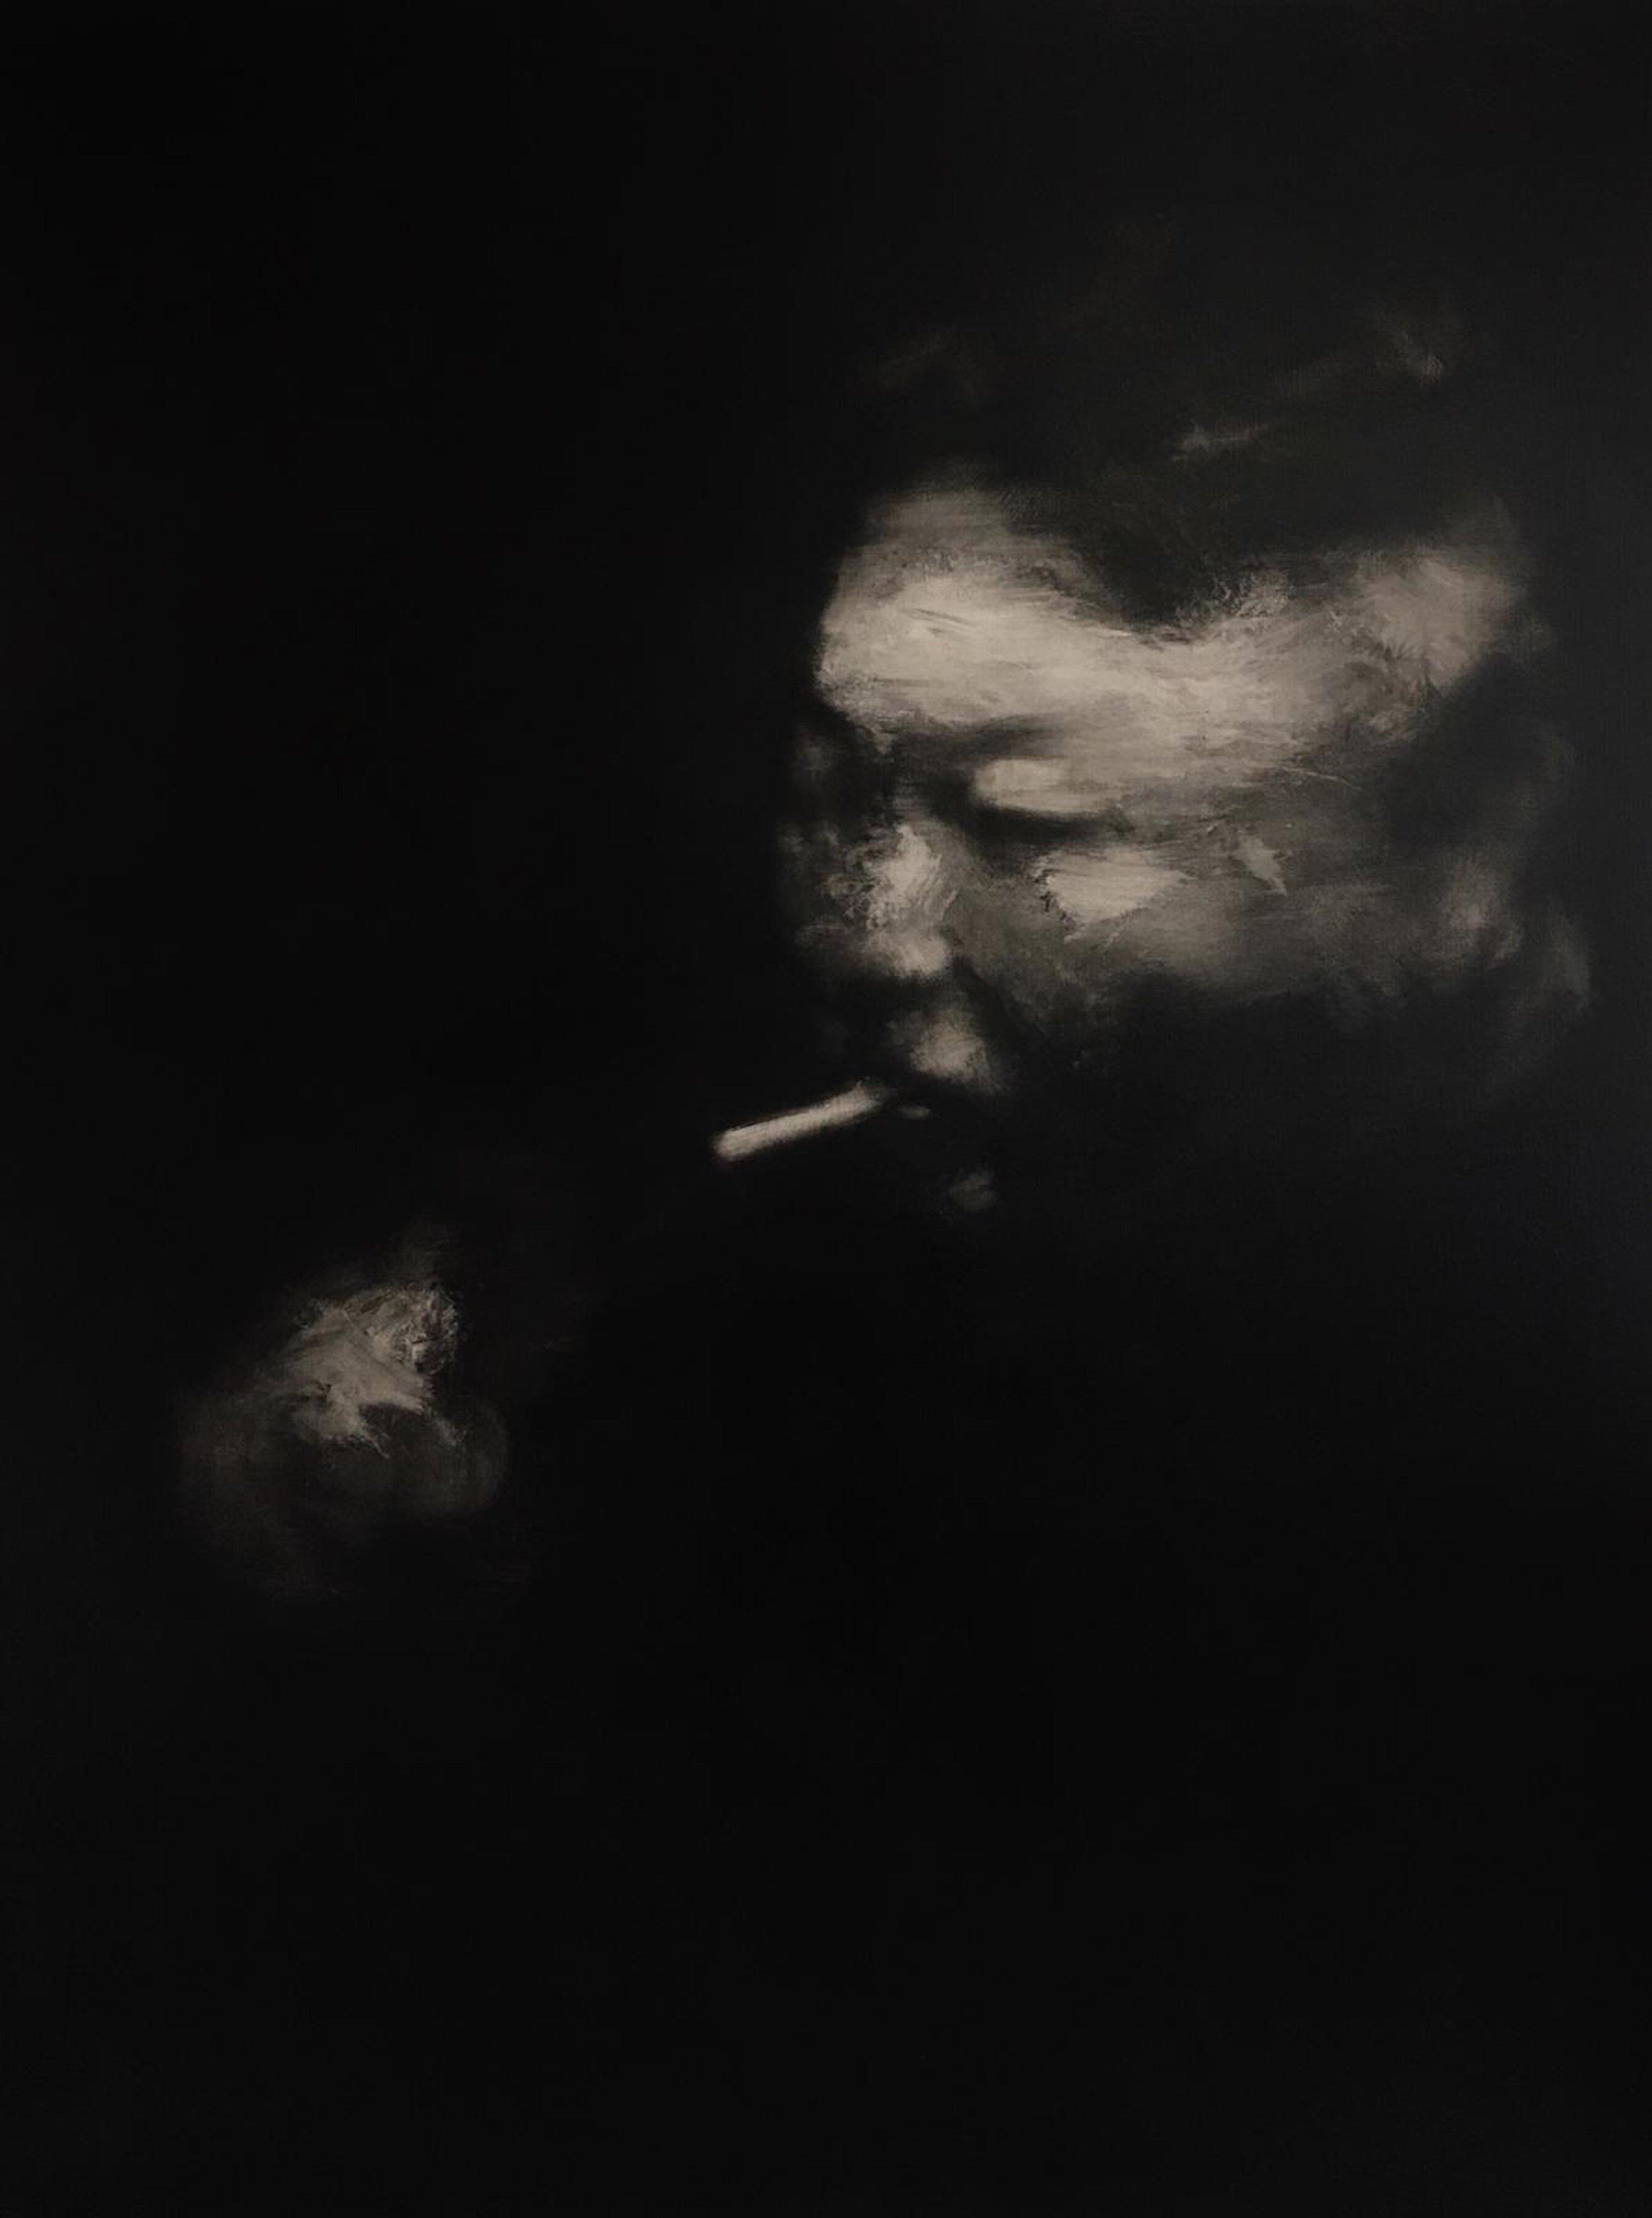 Nadia Arnold Ltd_Adam Riches_Untitled_2019_Oil on canvas_76x102cm_ USD 9000.jpg